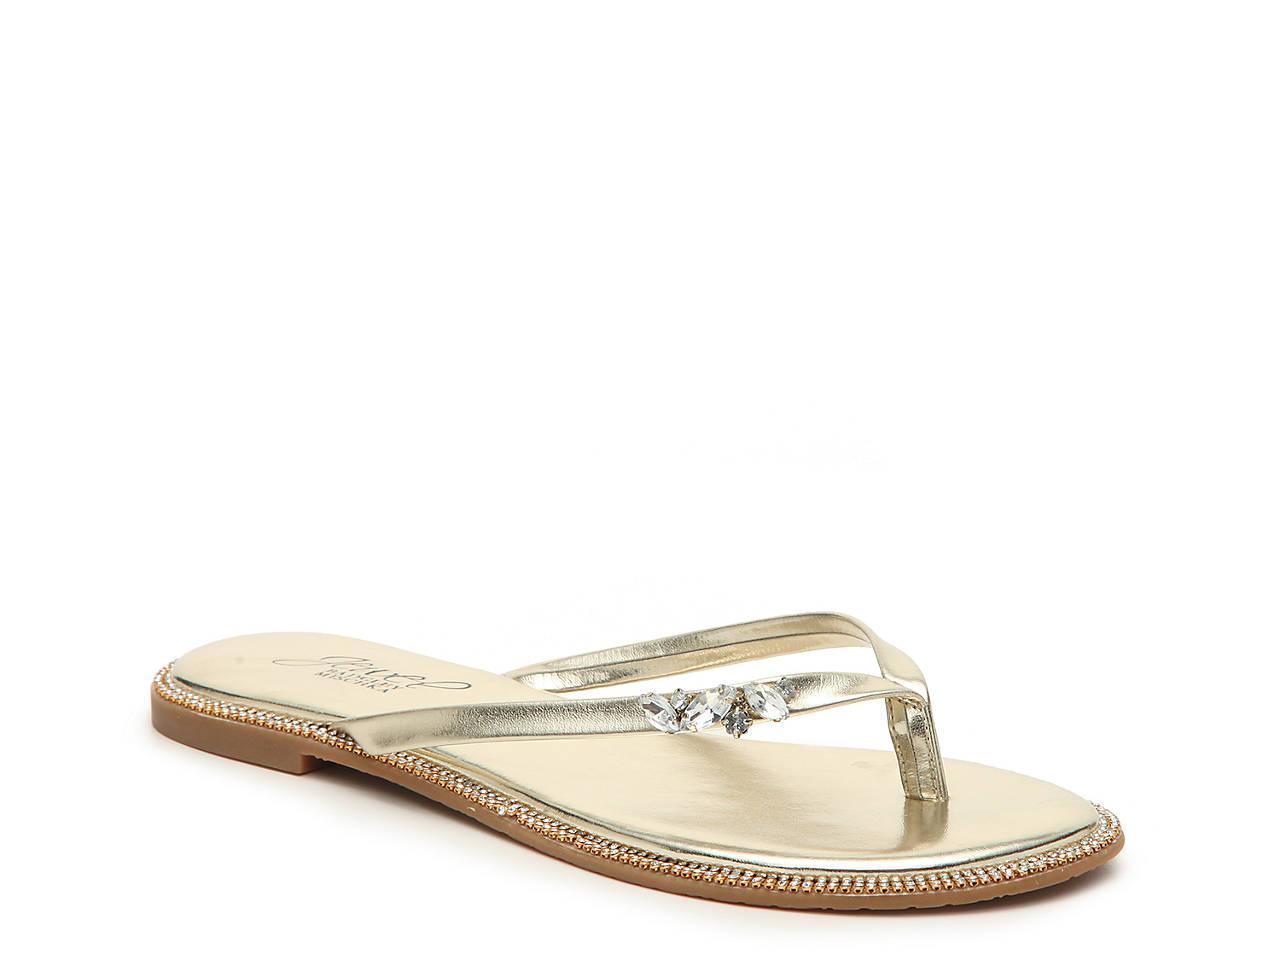 da3b0384ebb8 Jewel Badgley Mischka Thalia Sandal Women s Shoes